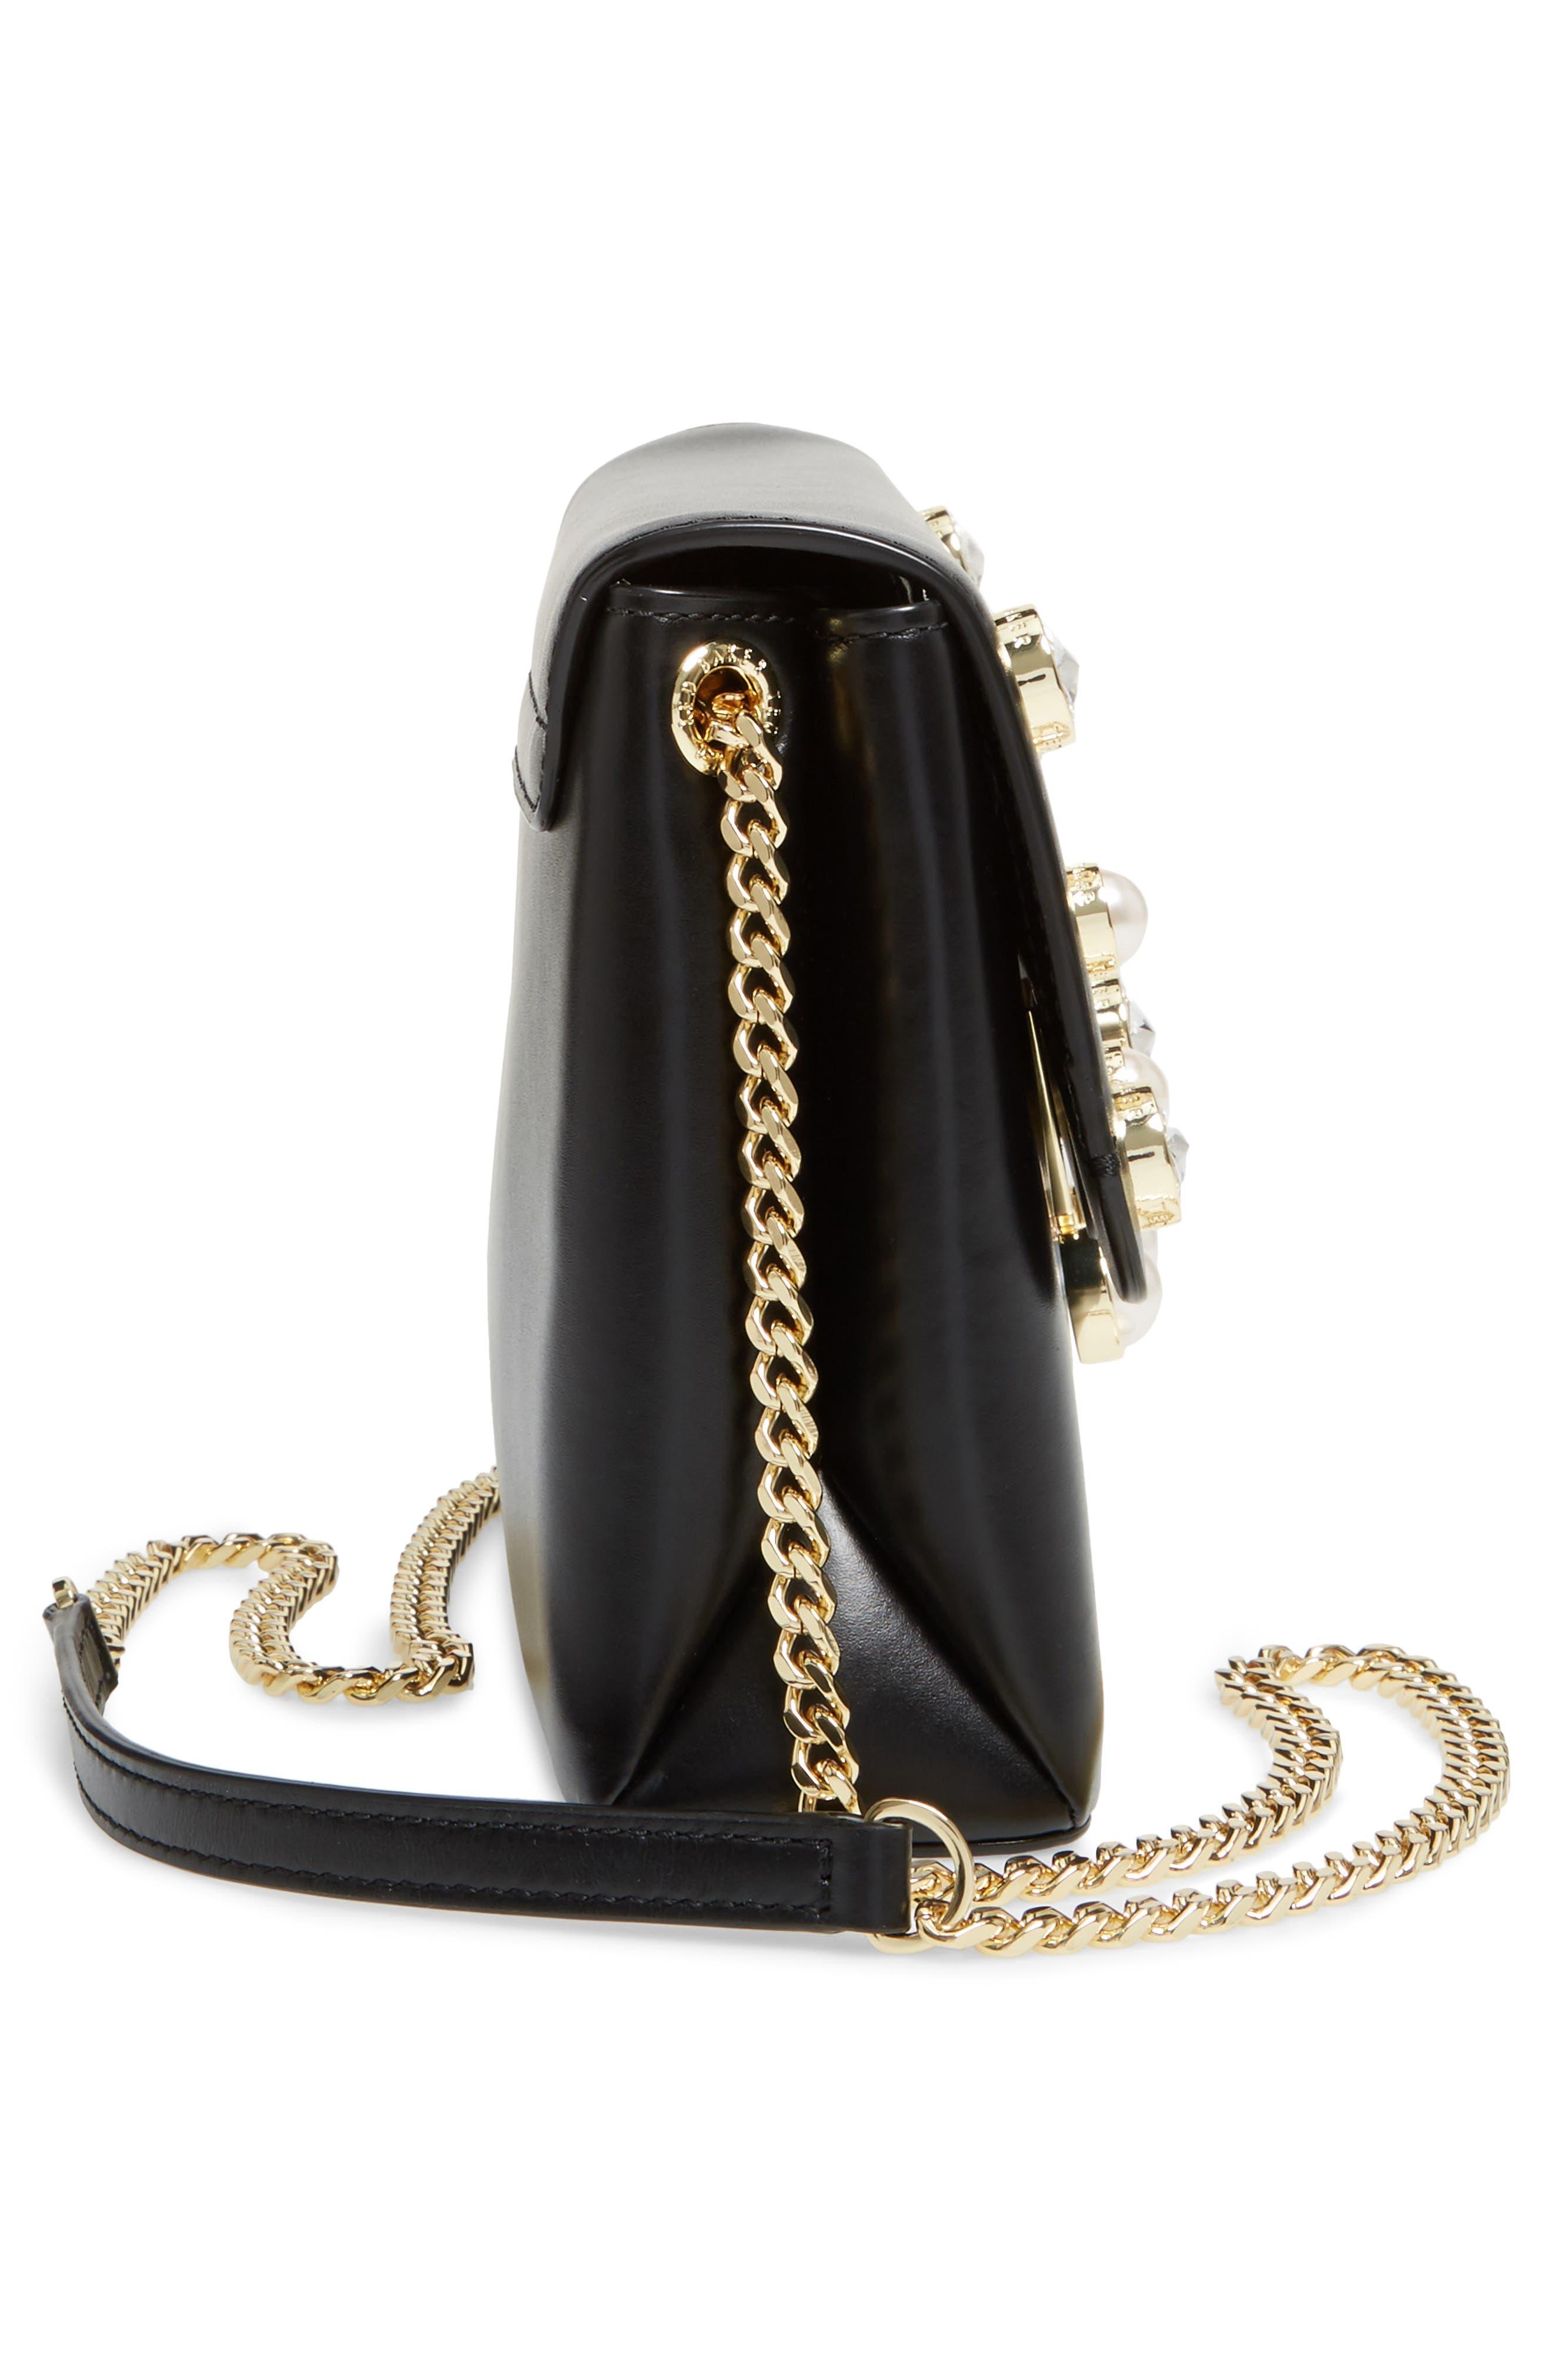 Saraa Leather Crossbody Bag,                             Alternate thumbnail 5, color,                             001